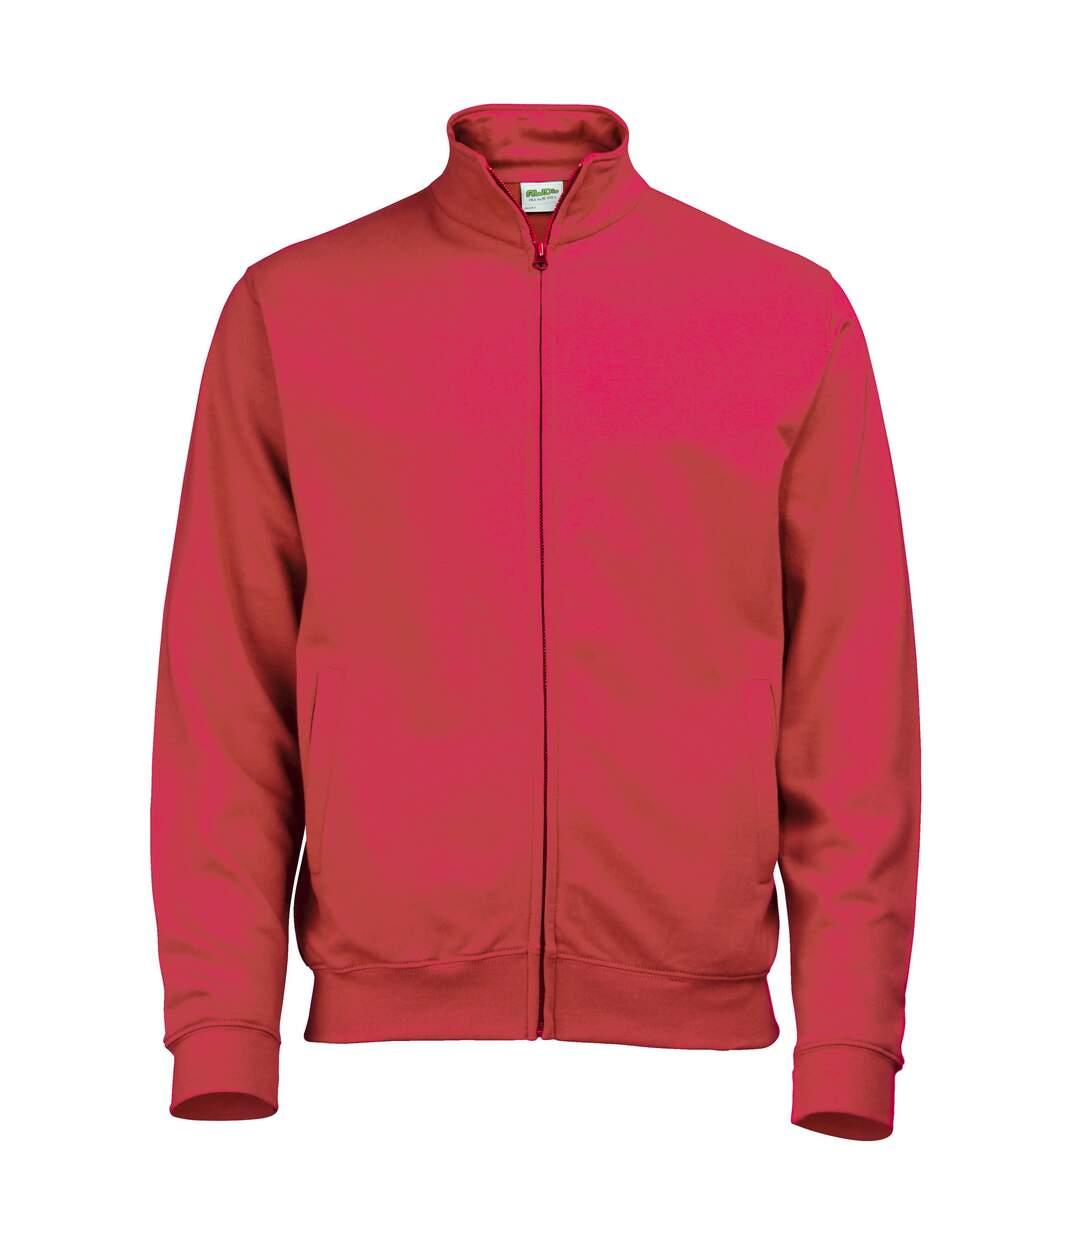 Awdis Mens Plain Fresher Full Zip Sweat / Sweatshirt / Outerwear (Heather Grey) - UTRW178